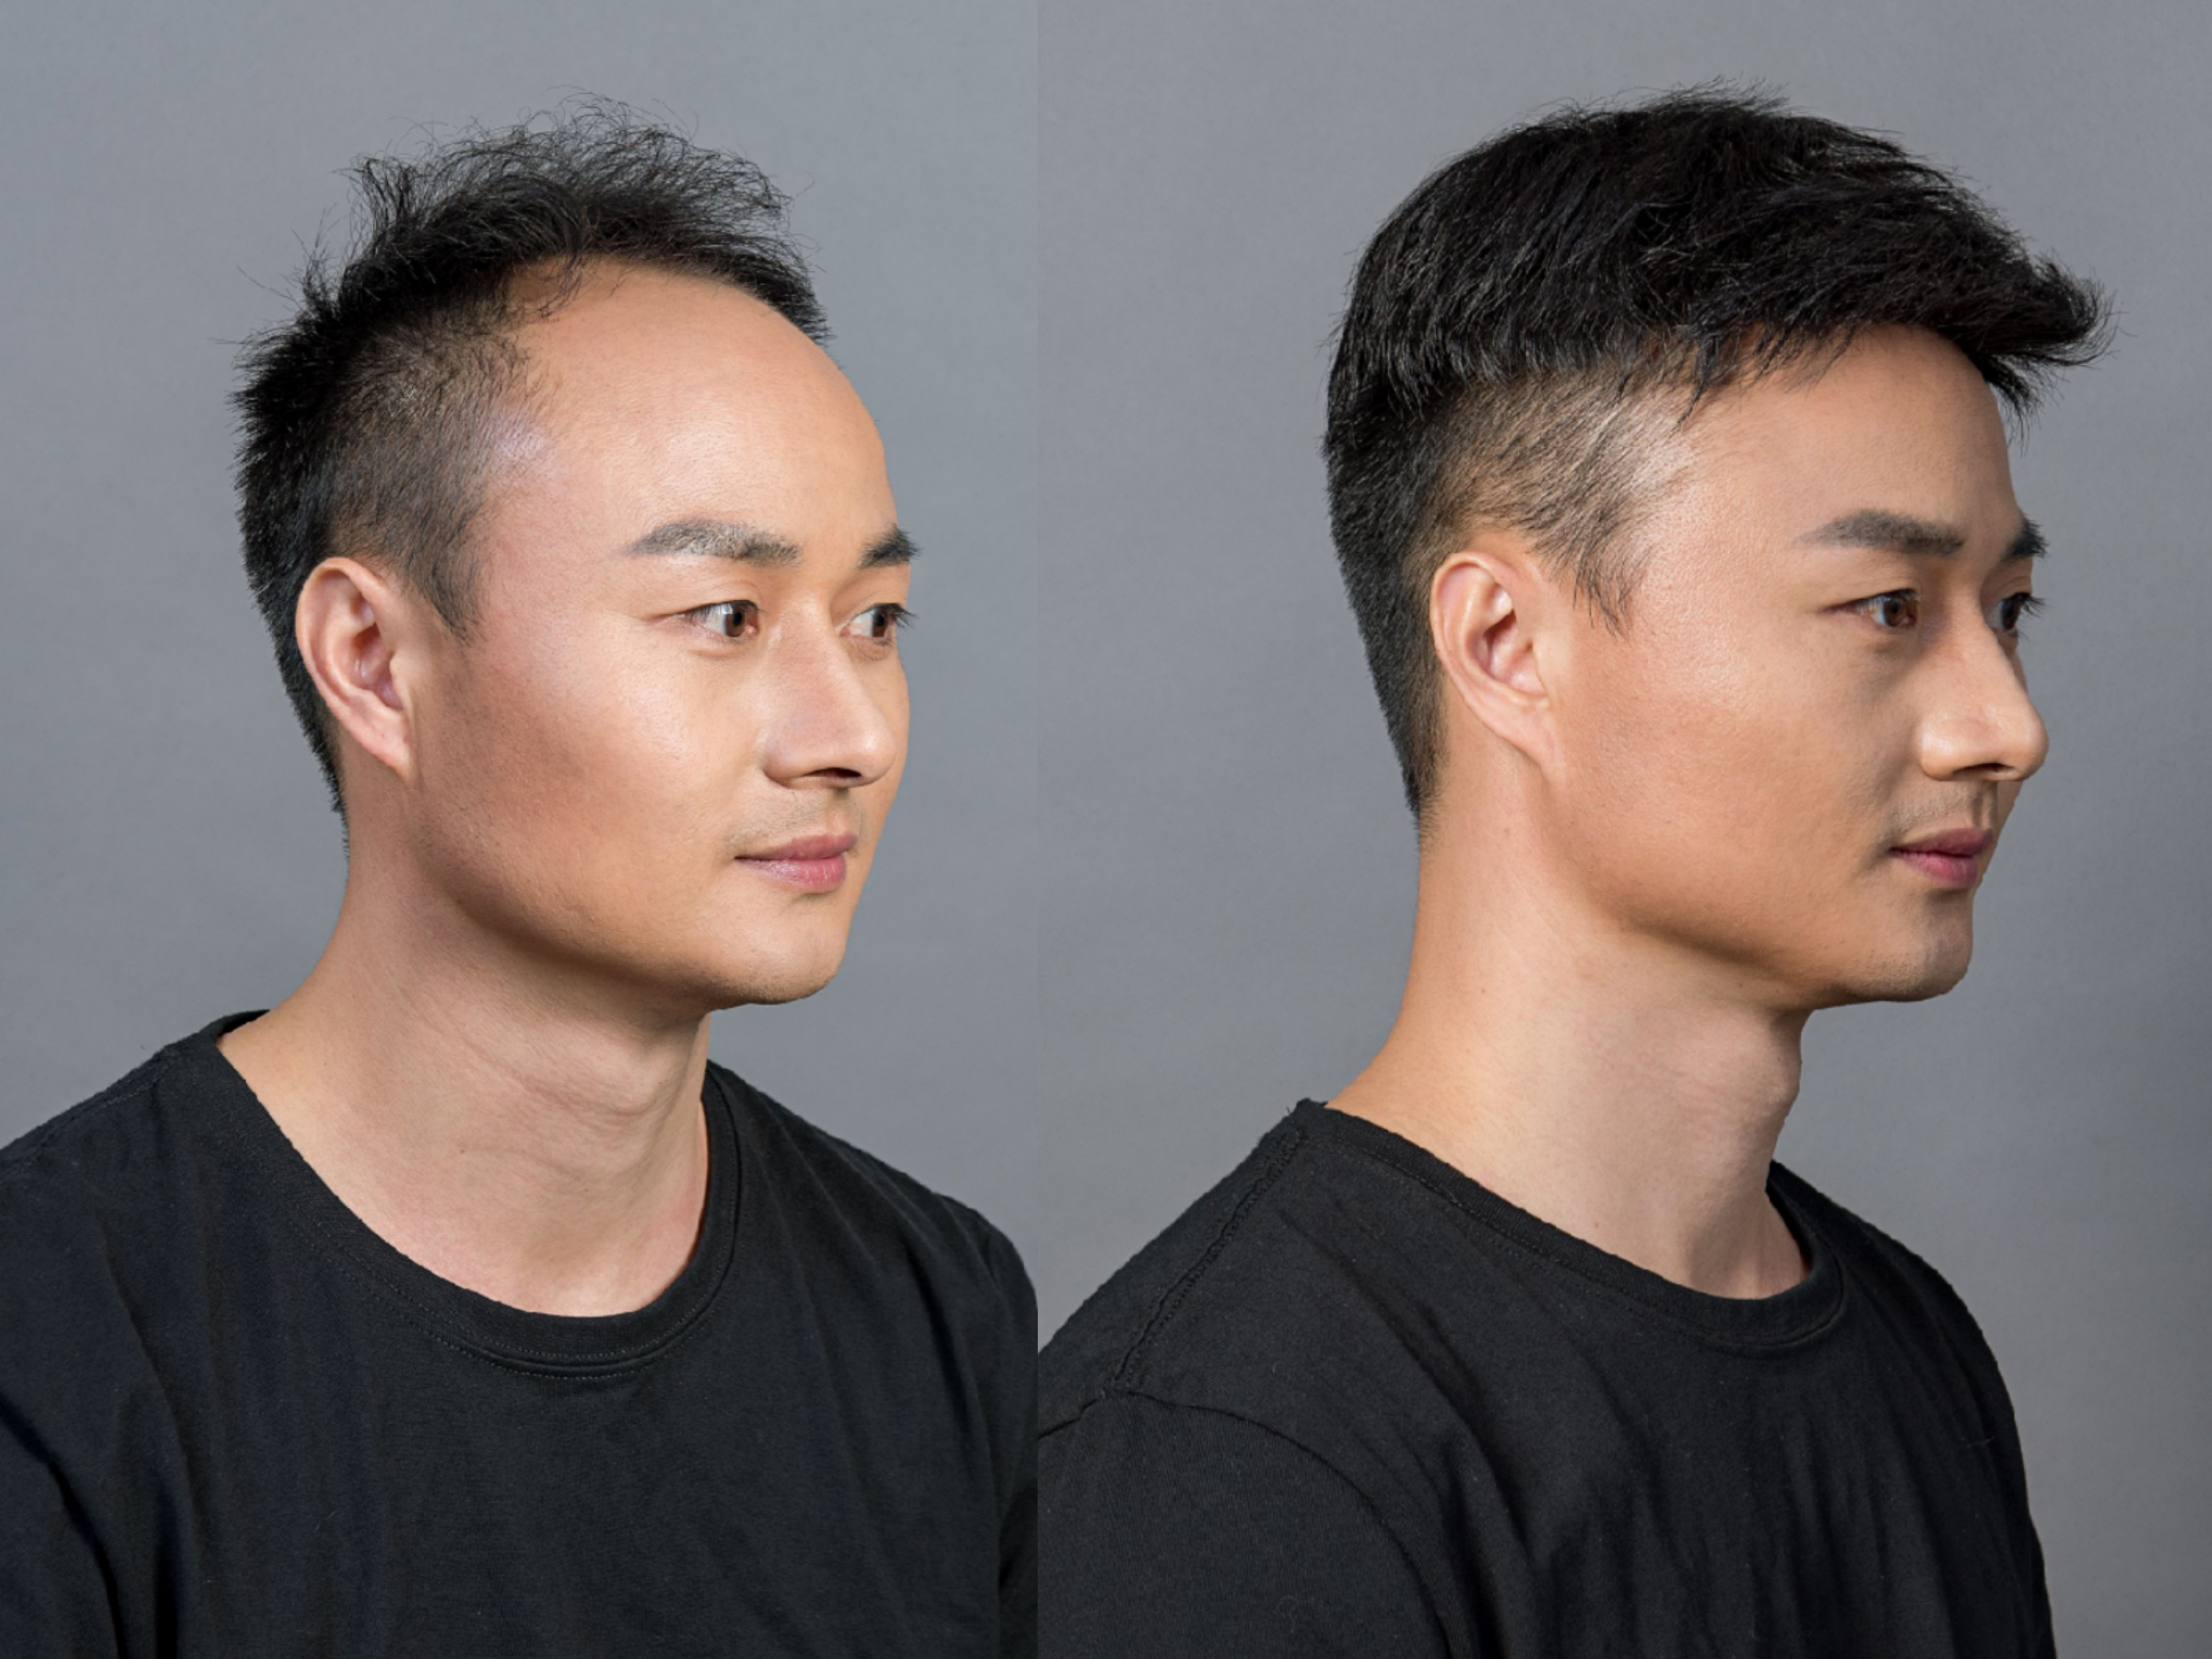 sistema de reemplazo de cabello humano